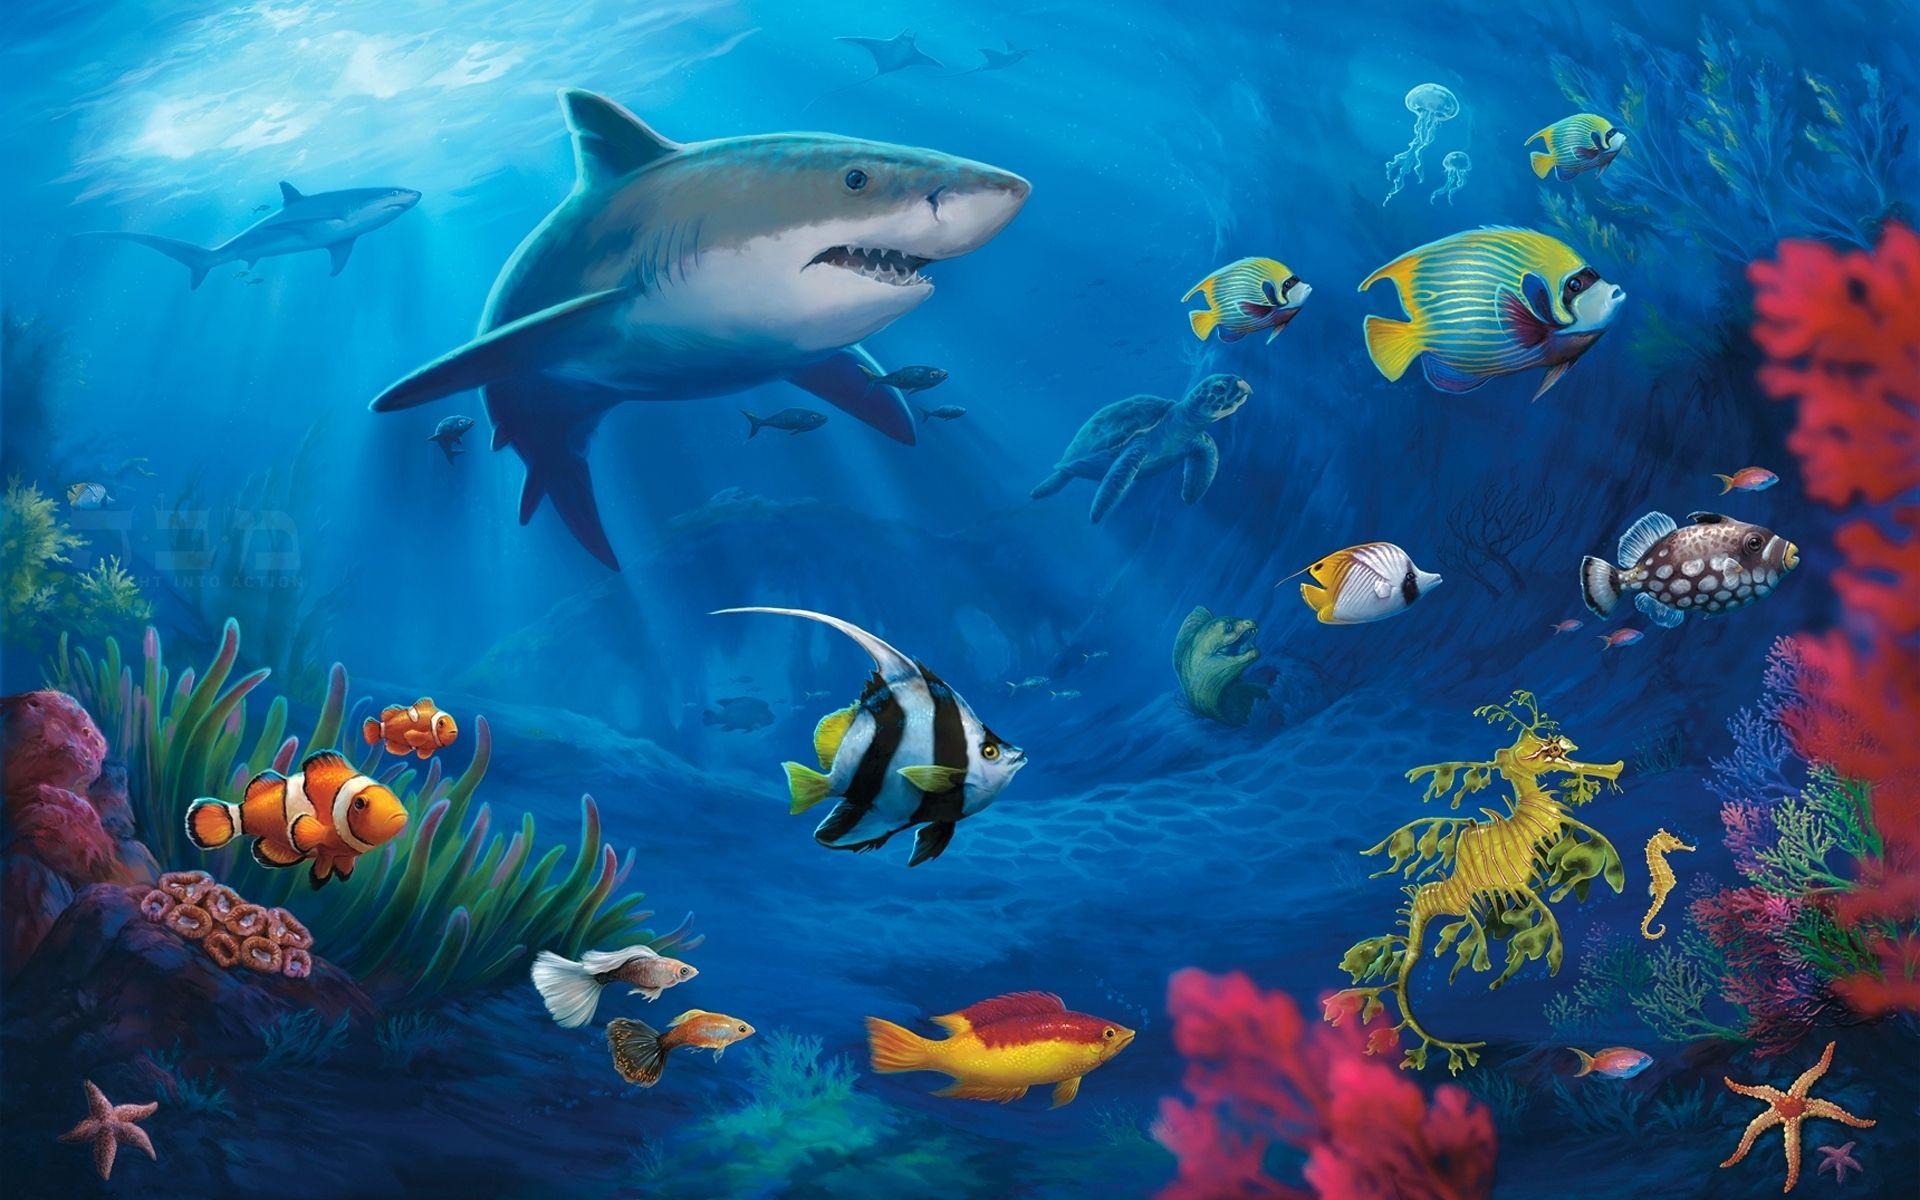 Underwater Sea Life Paintings Ocean Sea Sealife Color Bright Sunlight Plants Reef Coral Fins Art Fish Wallpaper Live Fish Wallpaper Underwater Wallpaper